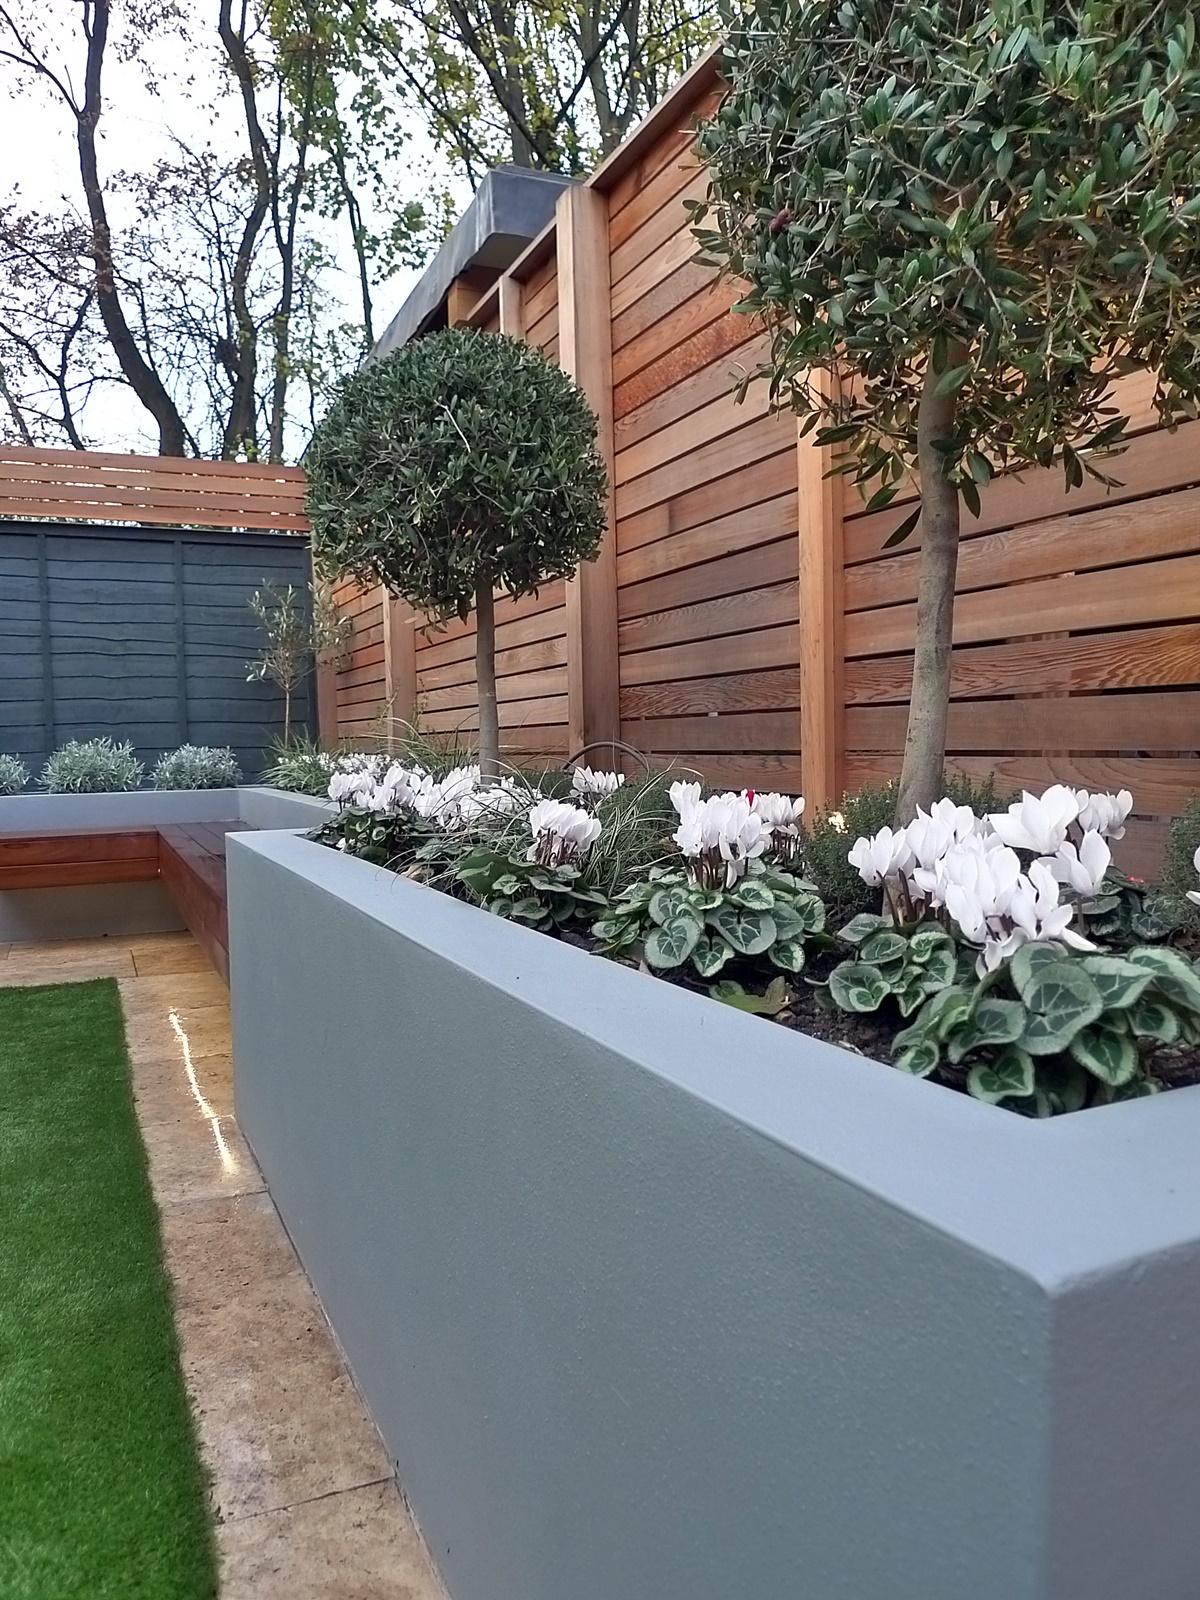 London garden design garden design for Garden design planting schemes